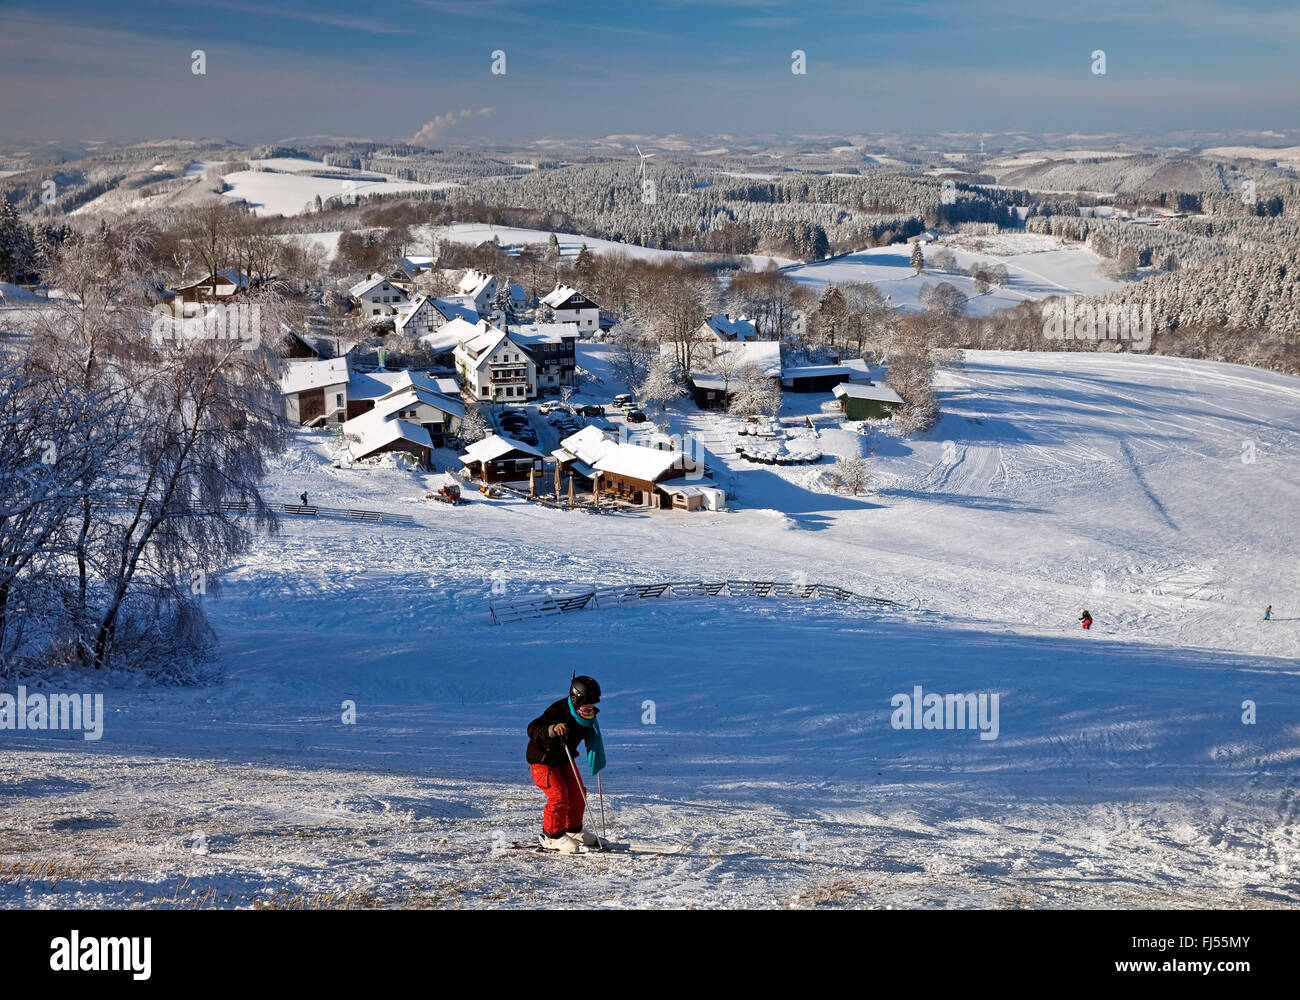 skier on a ski piste of Wildewiese, Germany, North Rhine-Westphalia, Sauerland, Sundern - Stock Image